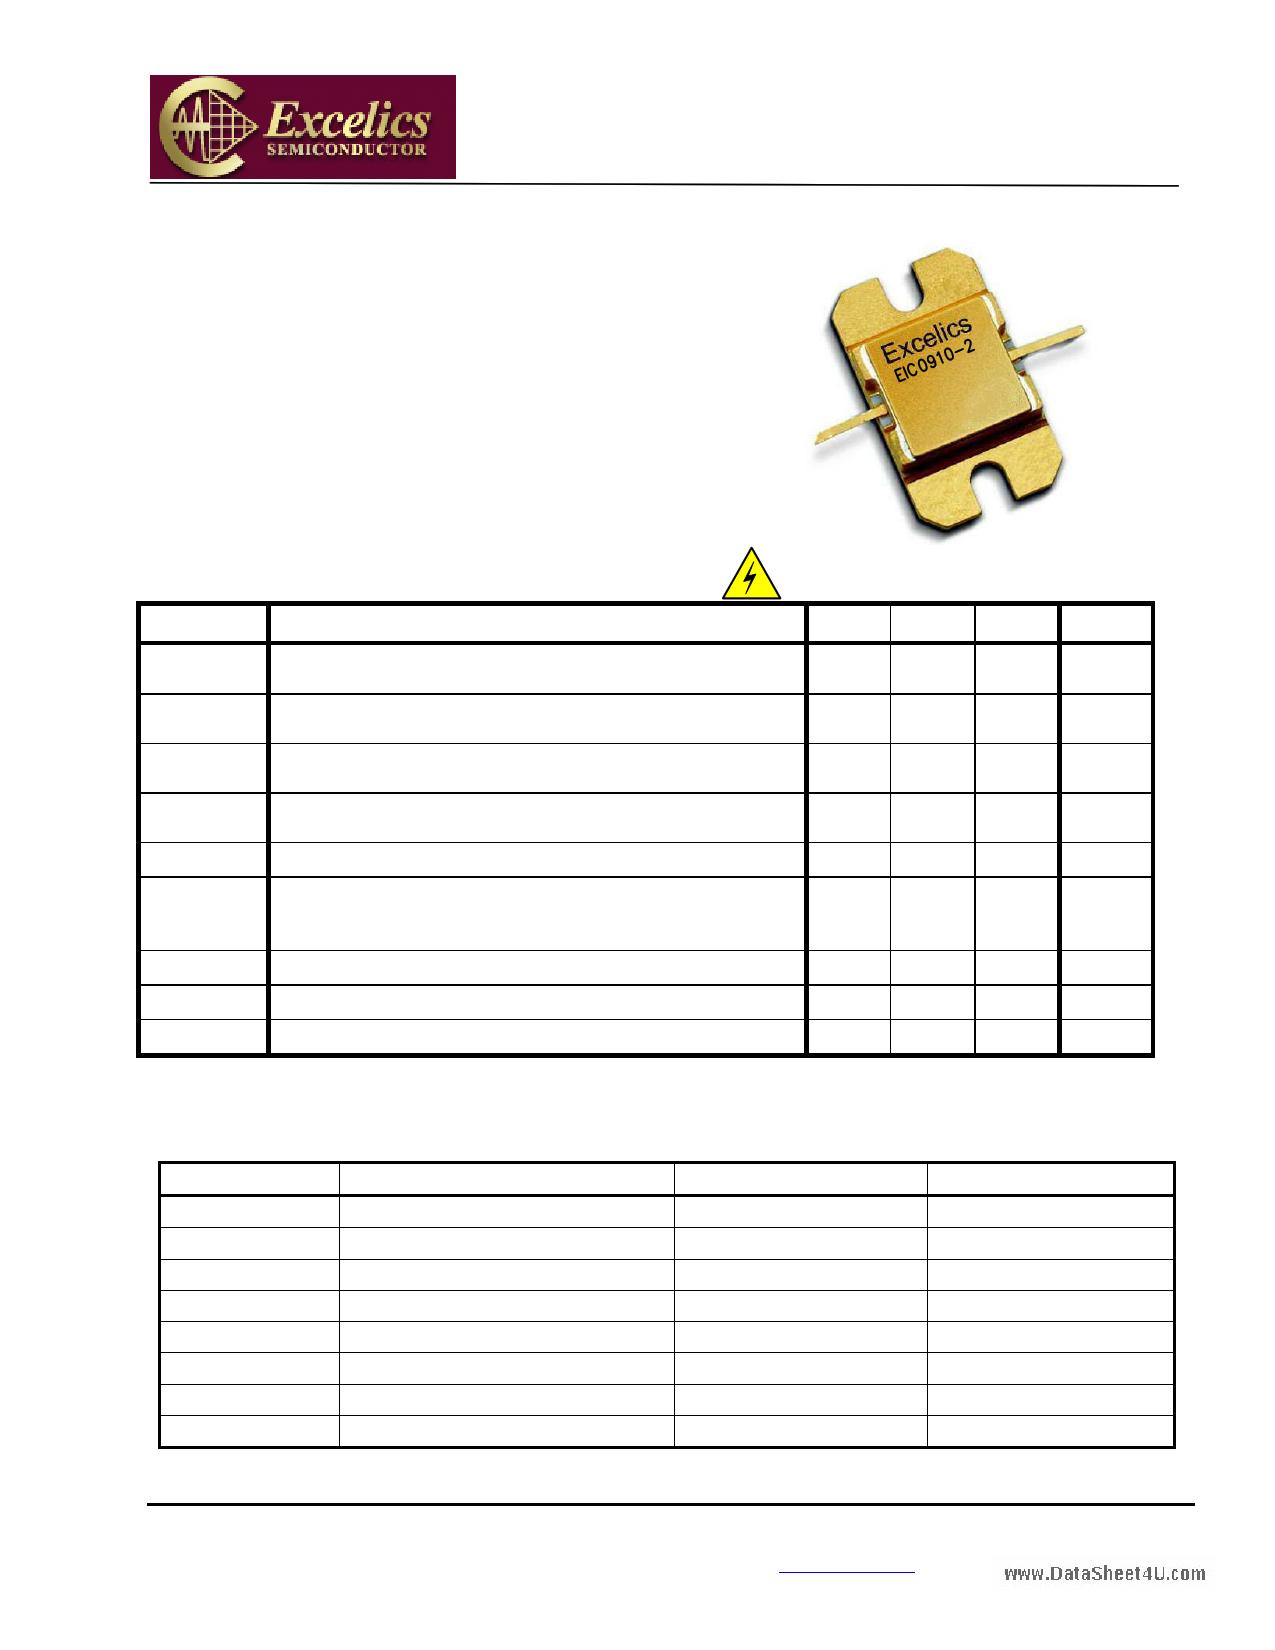 EIC0910-2 دیتاشیت PDF